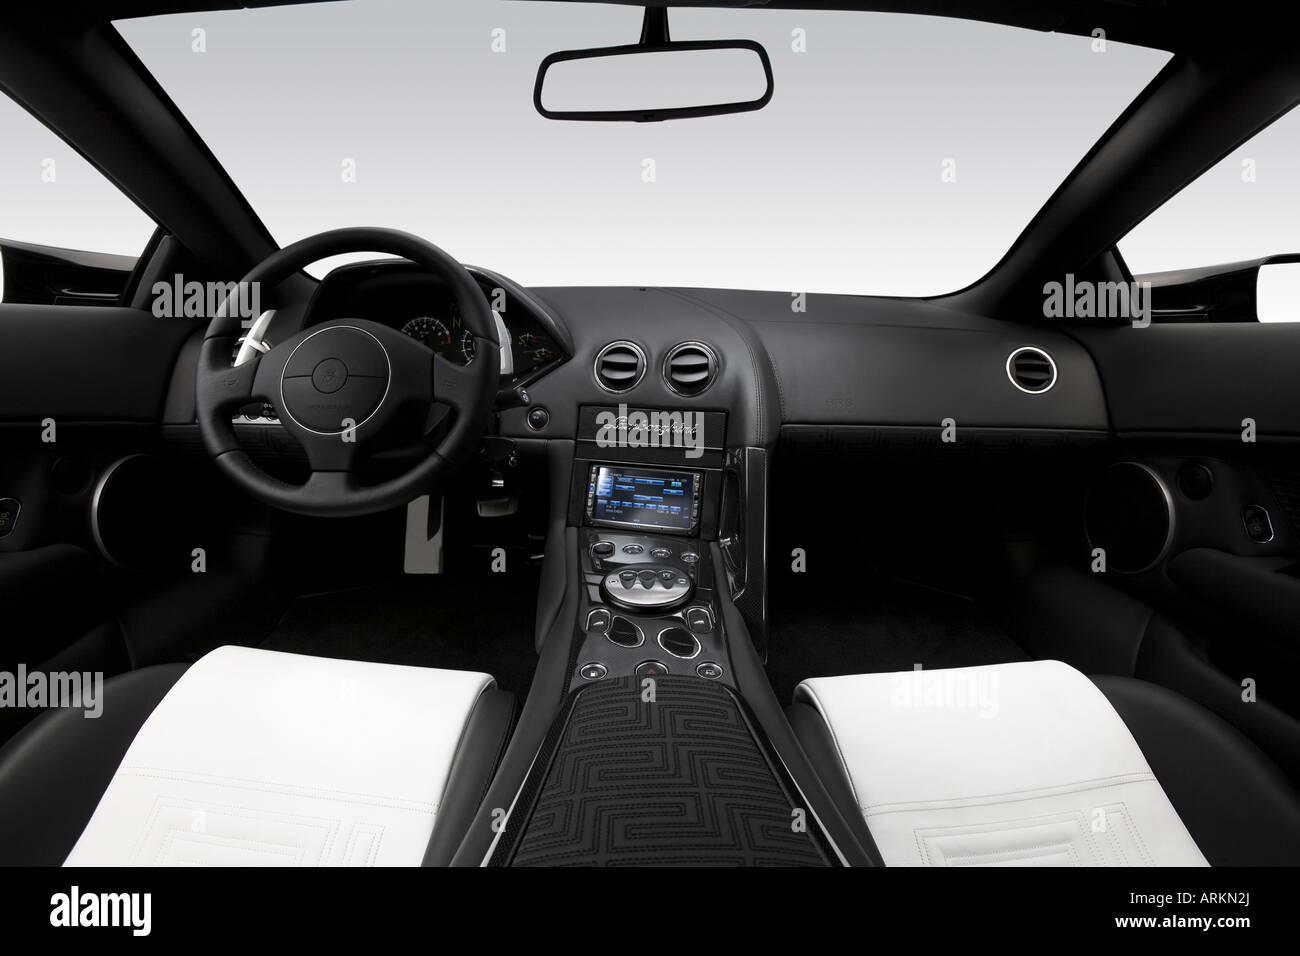 2007 Lamborghini Murcielago Lp640 Versace In Black Dashboard Stock